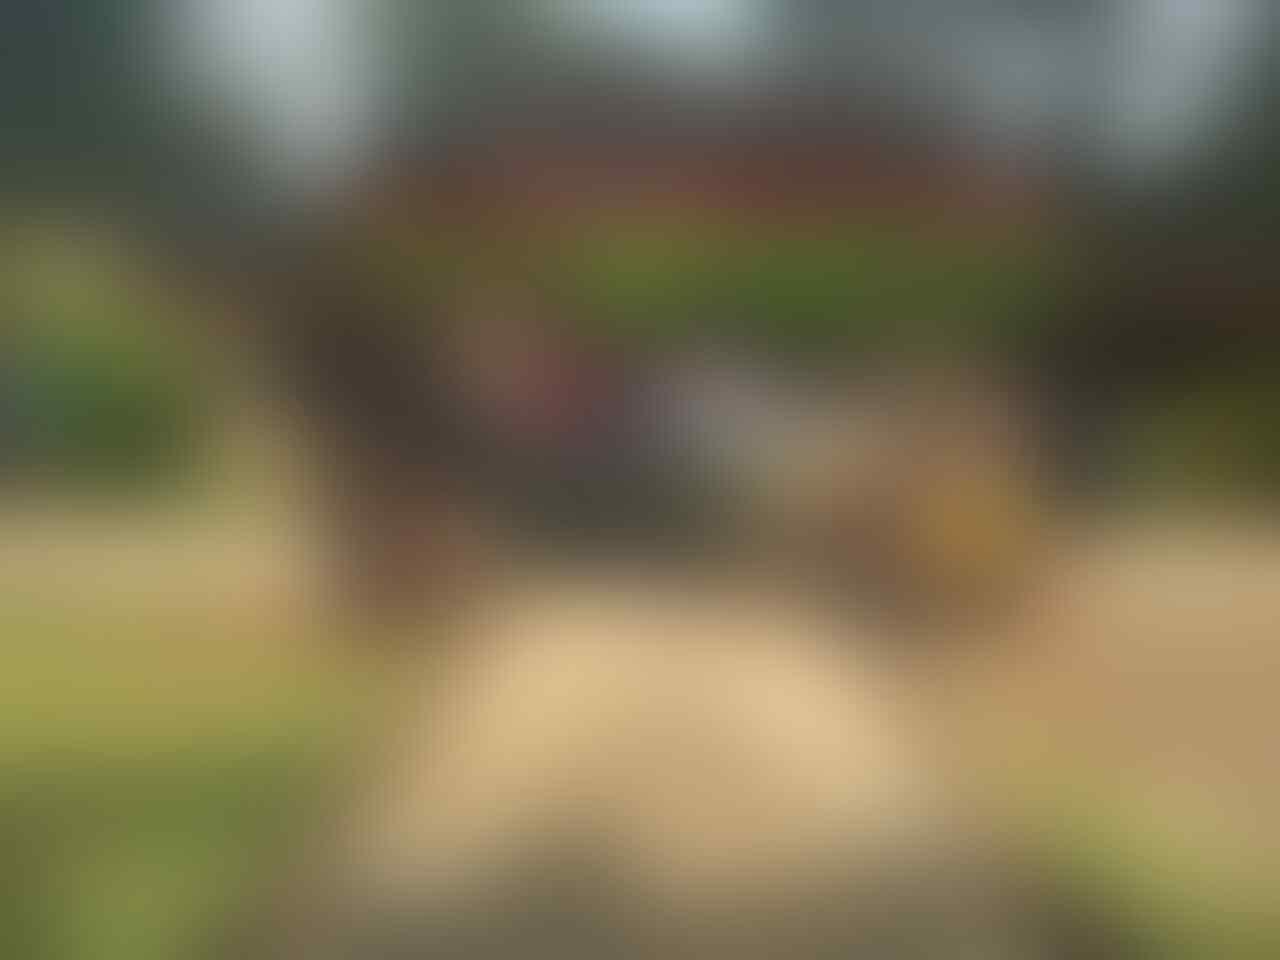 [ANYONE] ALL NEW YARIS INDONESIA CLUB